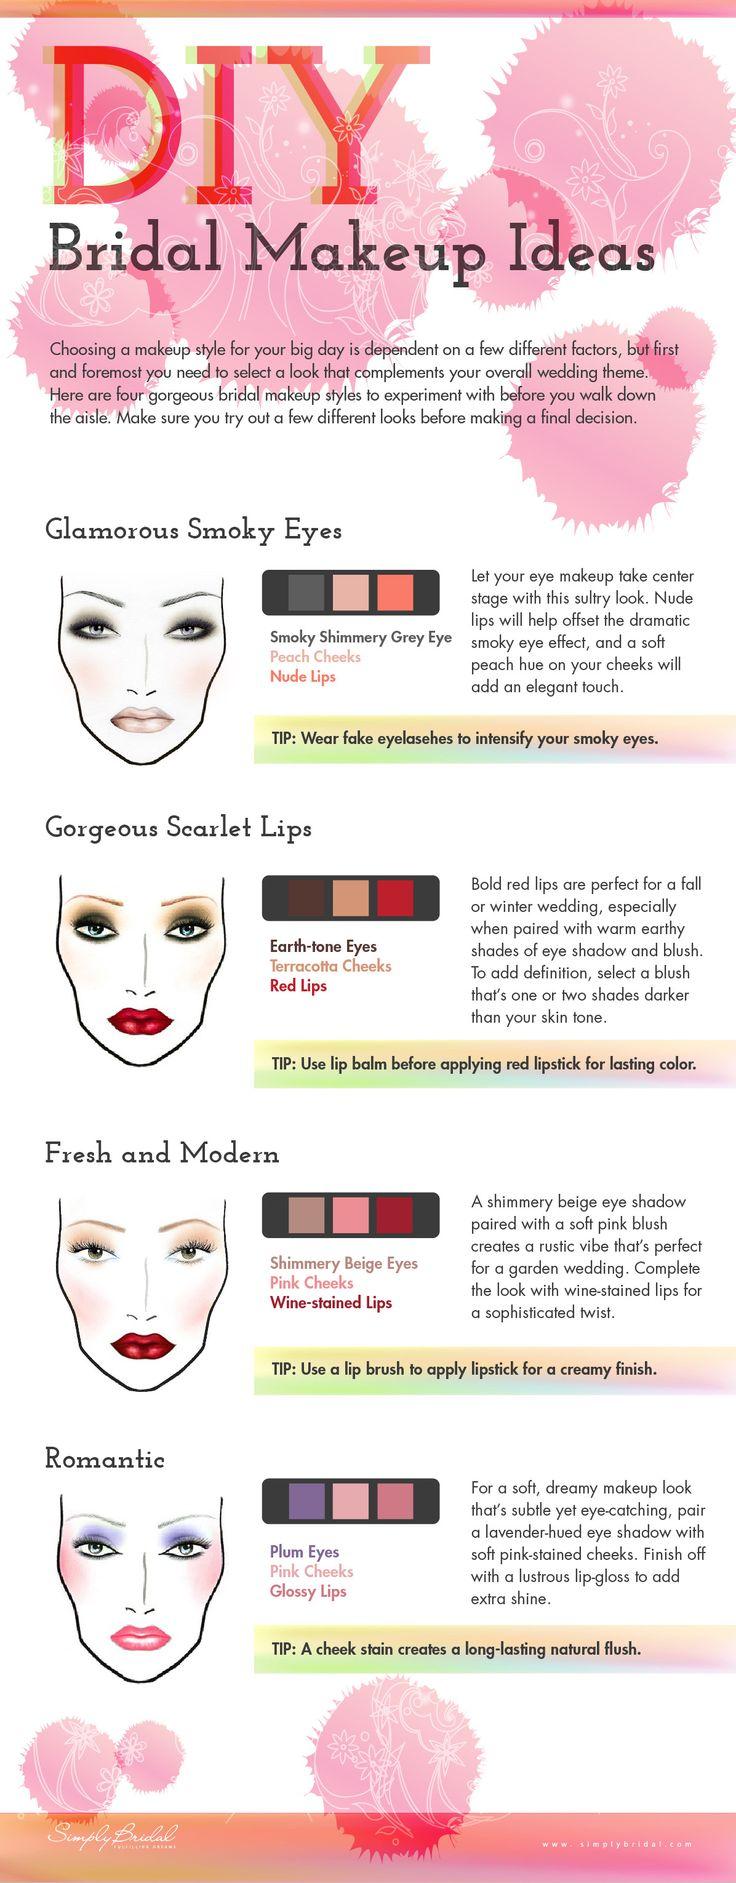 best blushing bride images on pinterest eye makeup tutorials